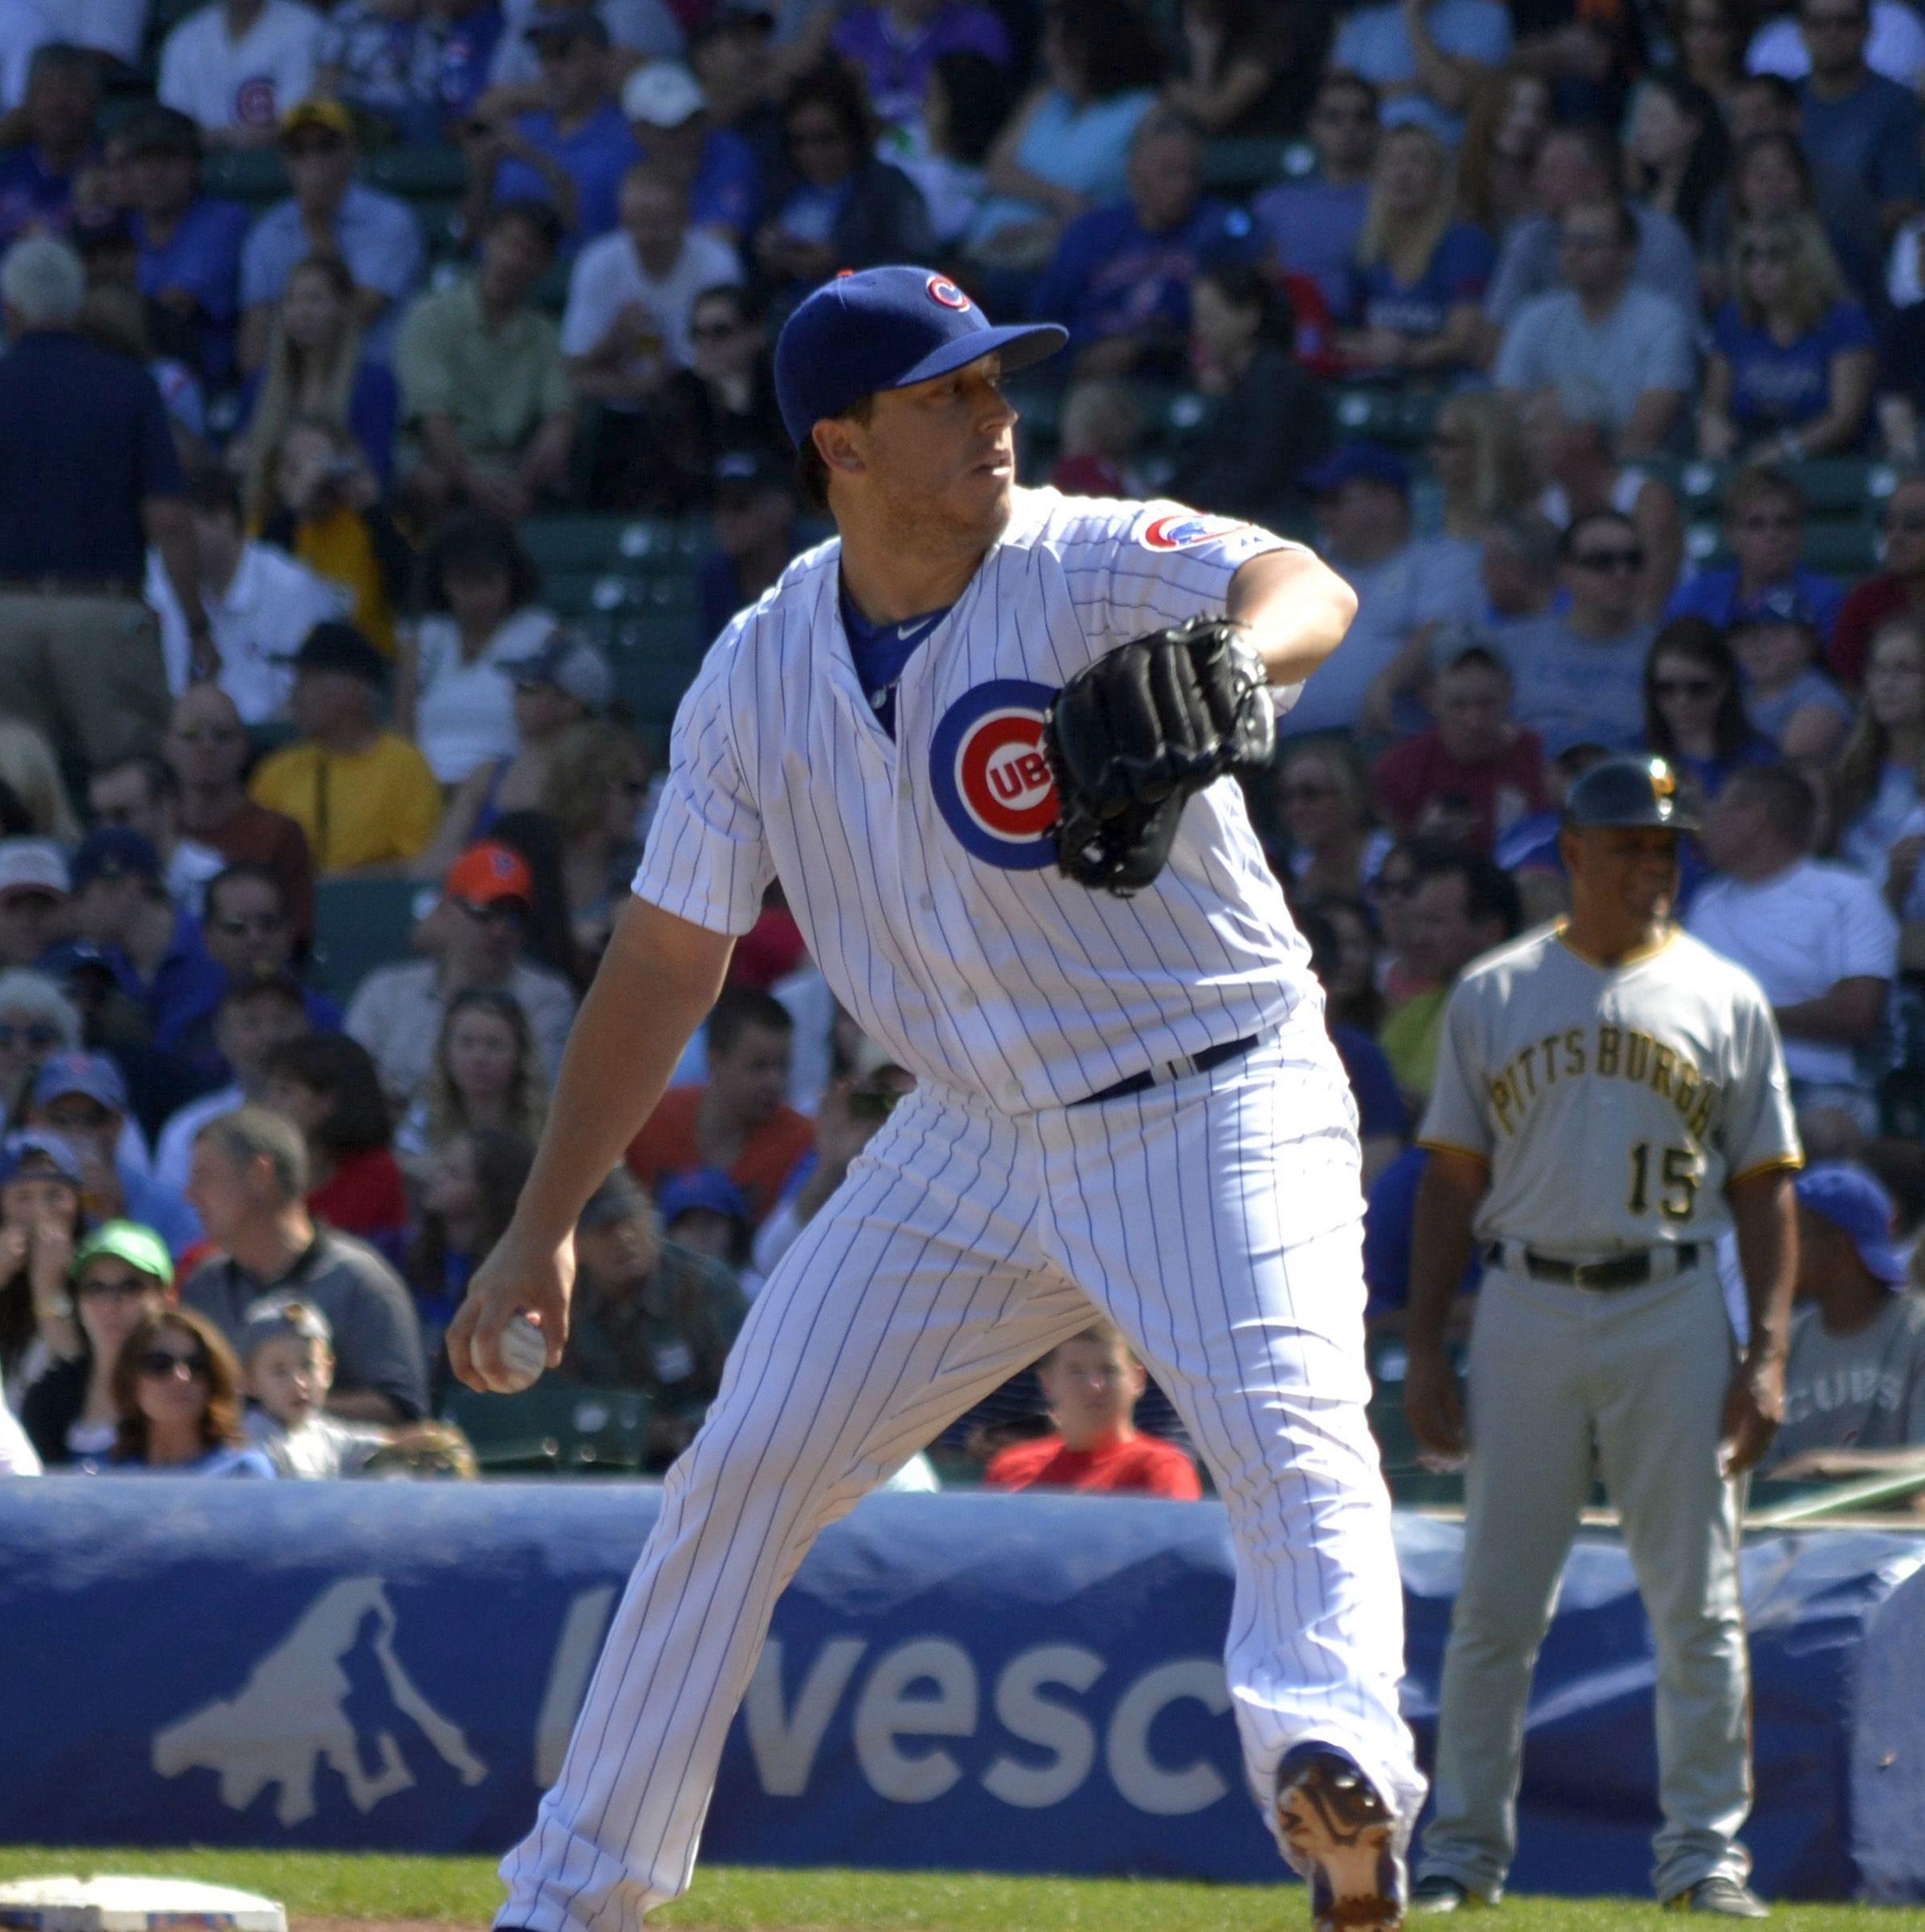 Jason Berken announces plans for new multimillion-dollar baseball and softball facility